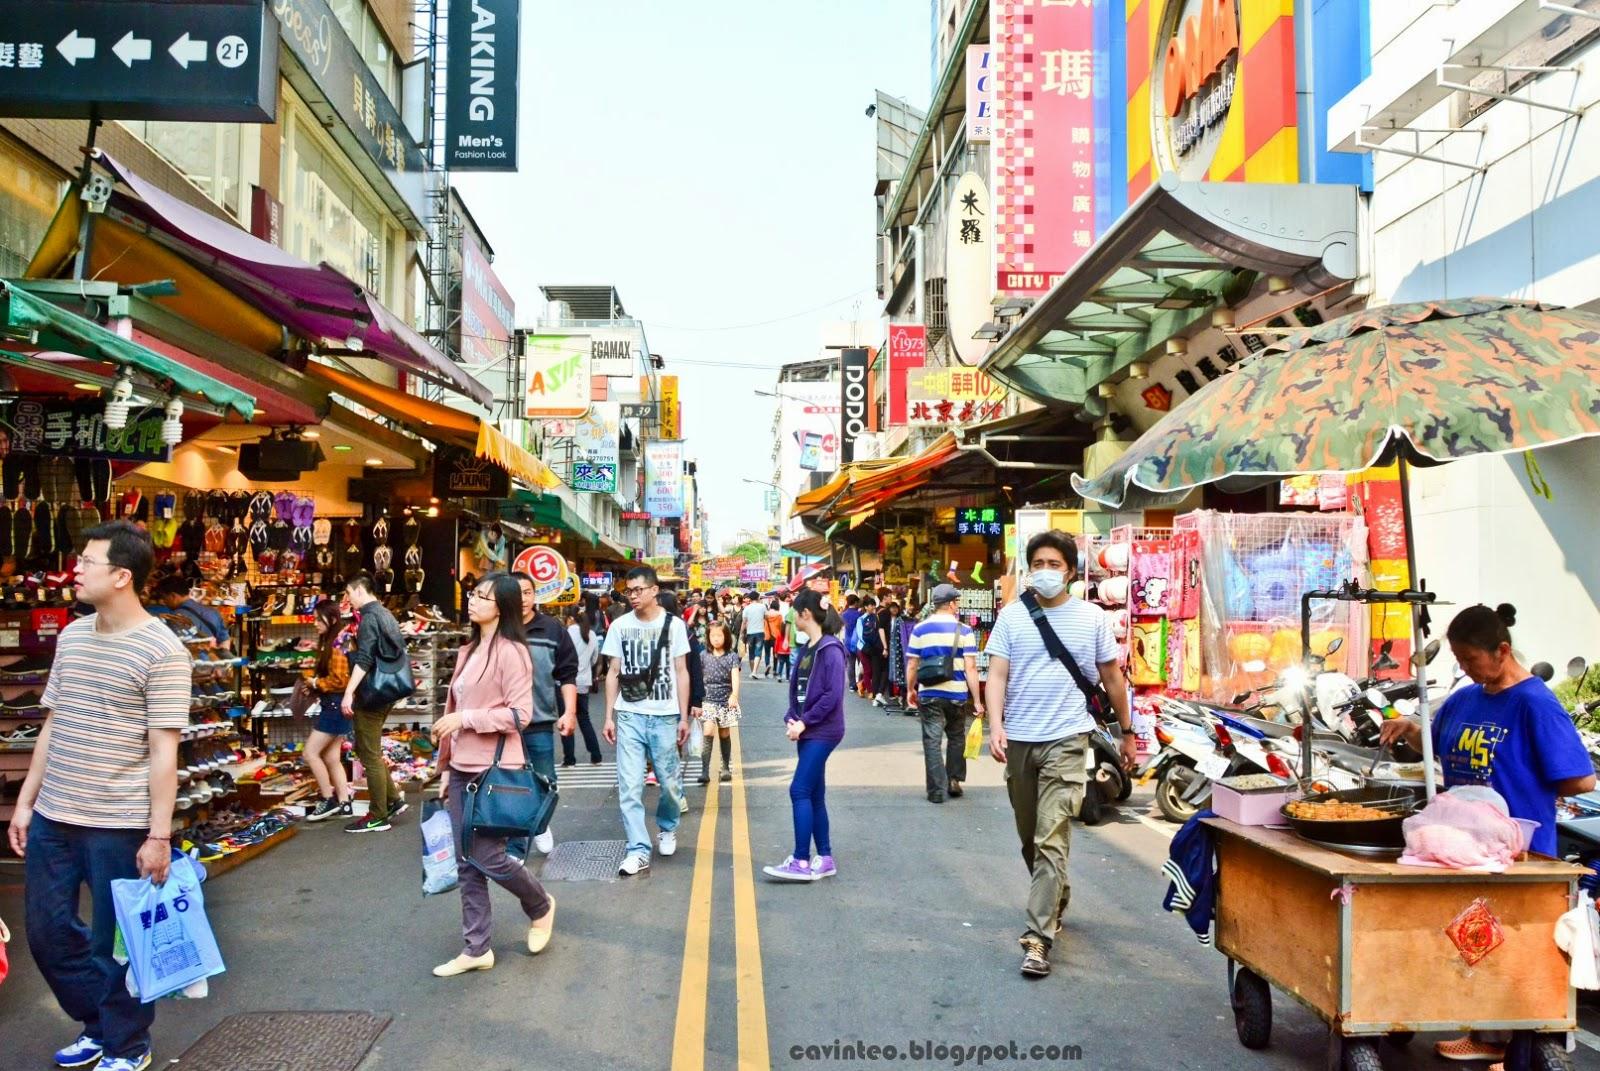 Entree Kibbles: Taichung Yizhong Street / Yizhong Market ... Market Street